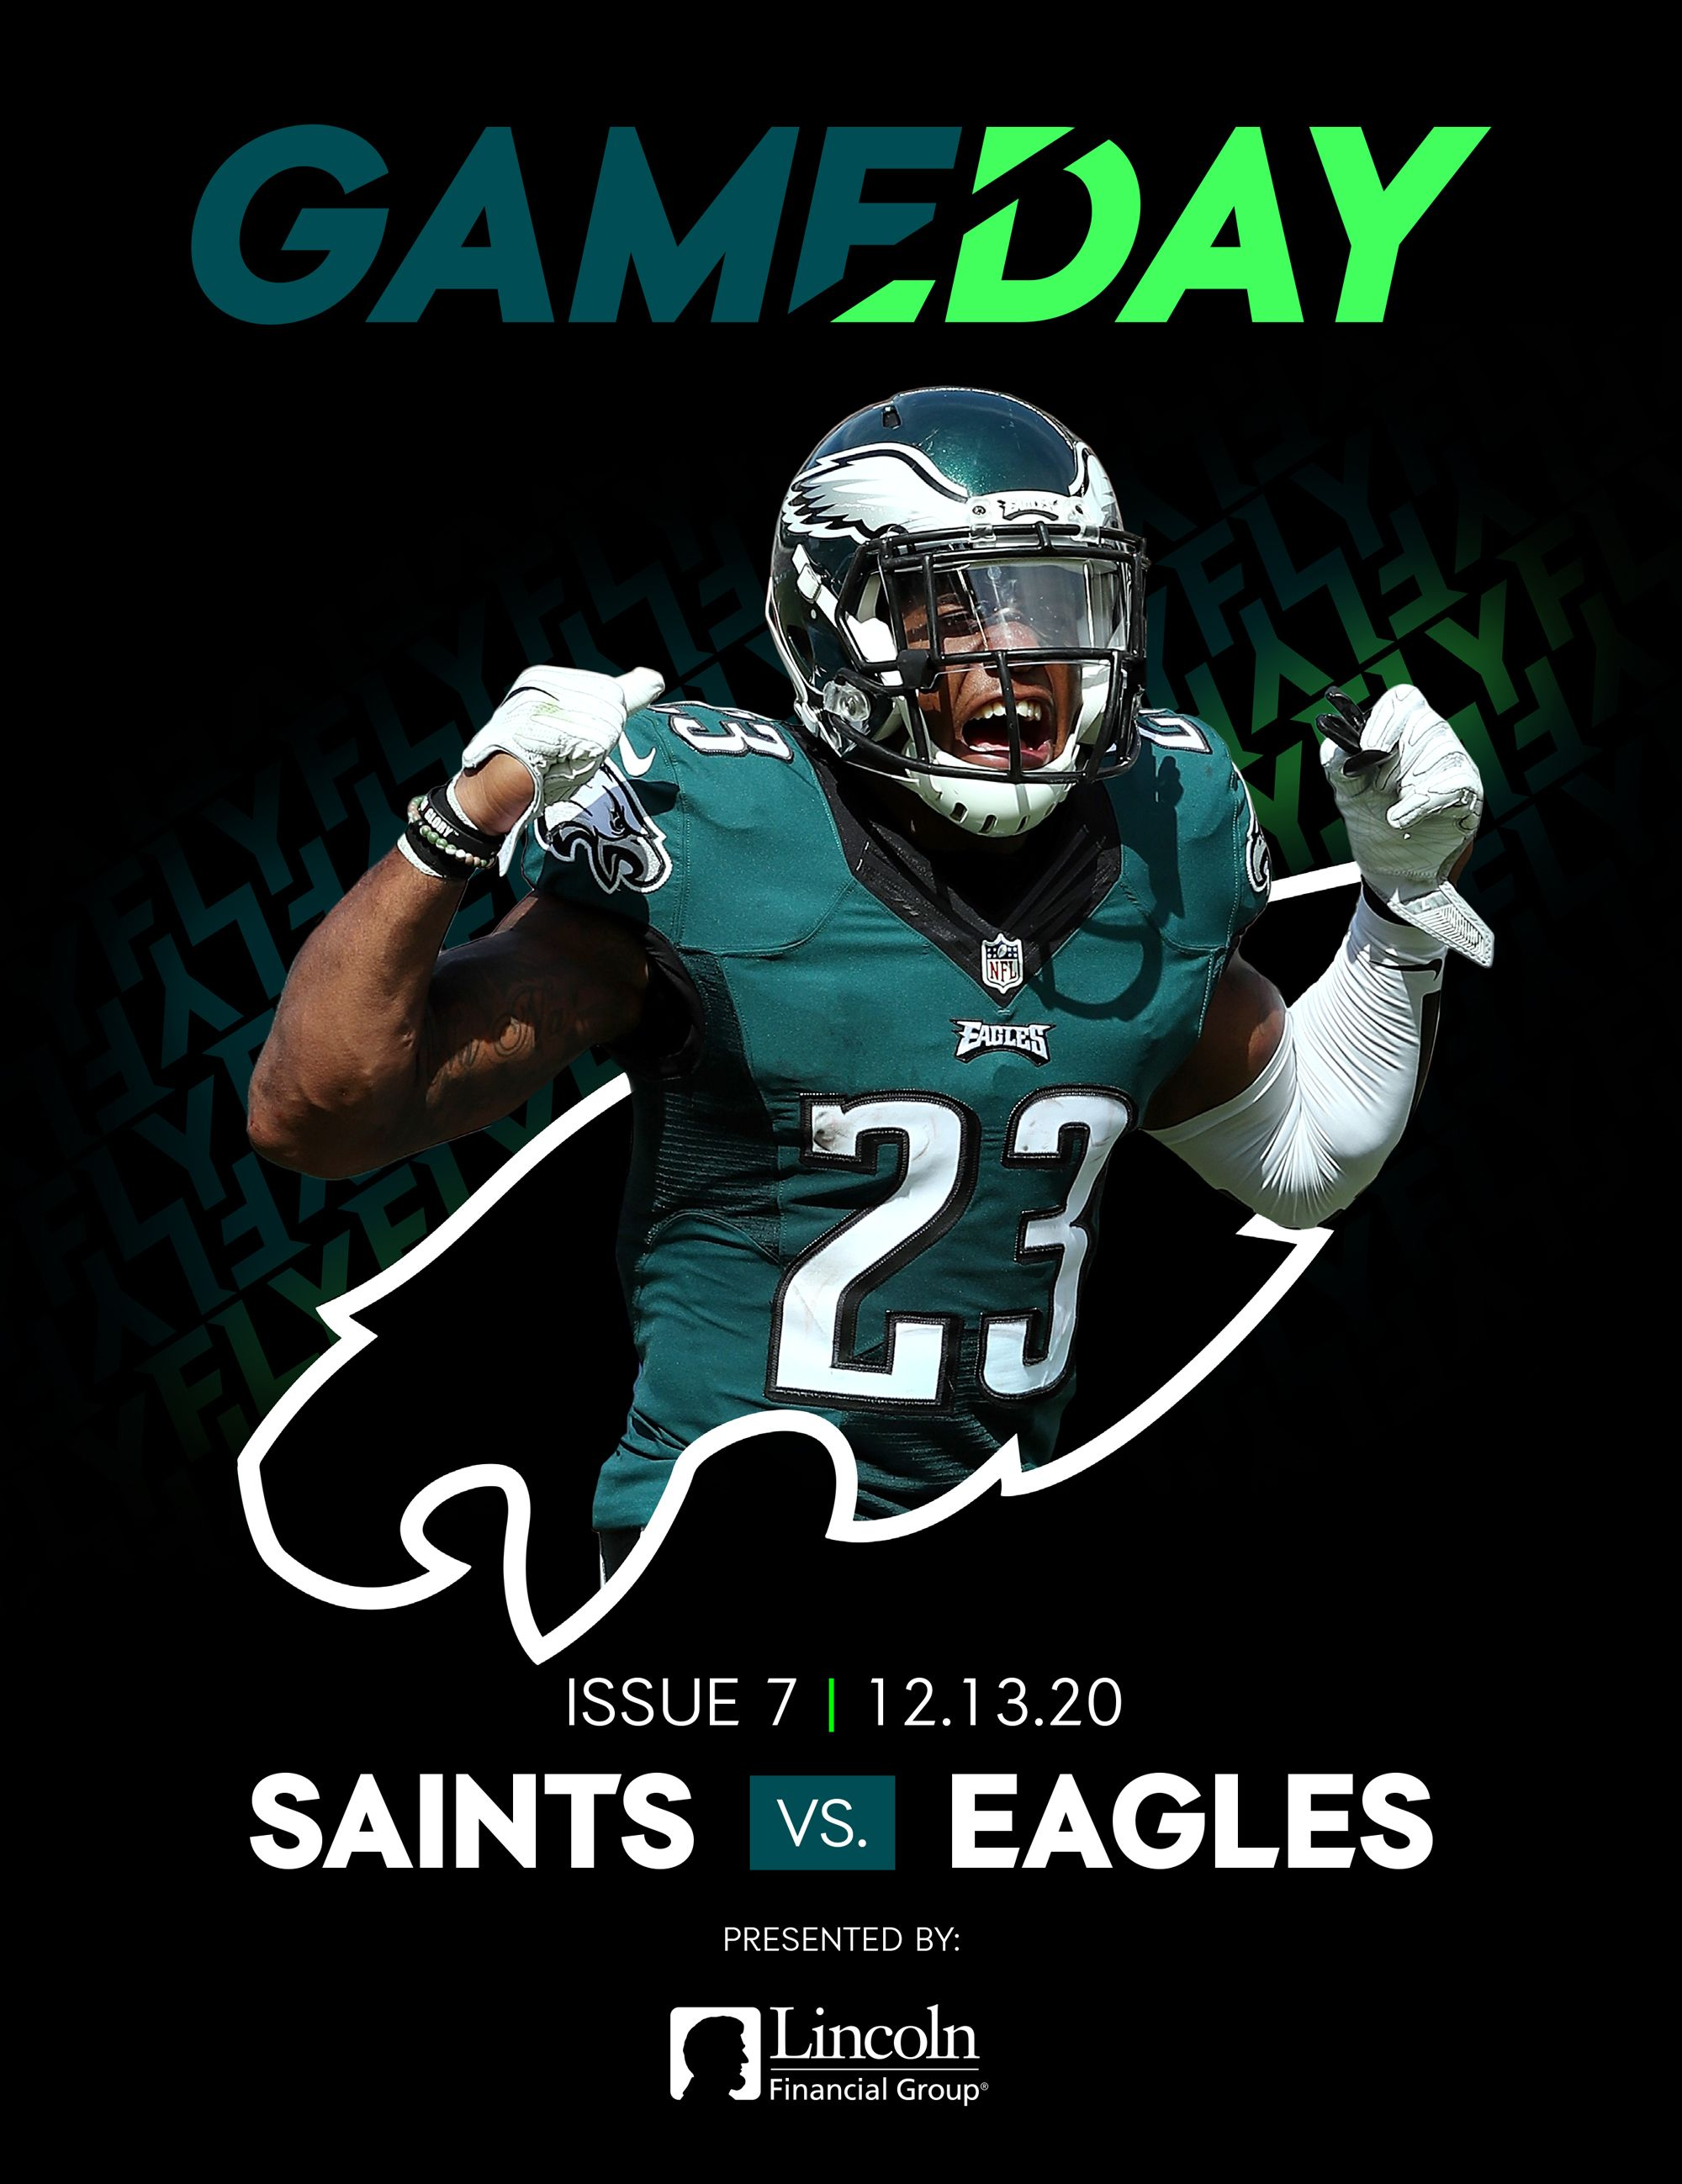 Saints vs. Eagles